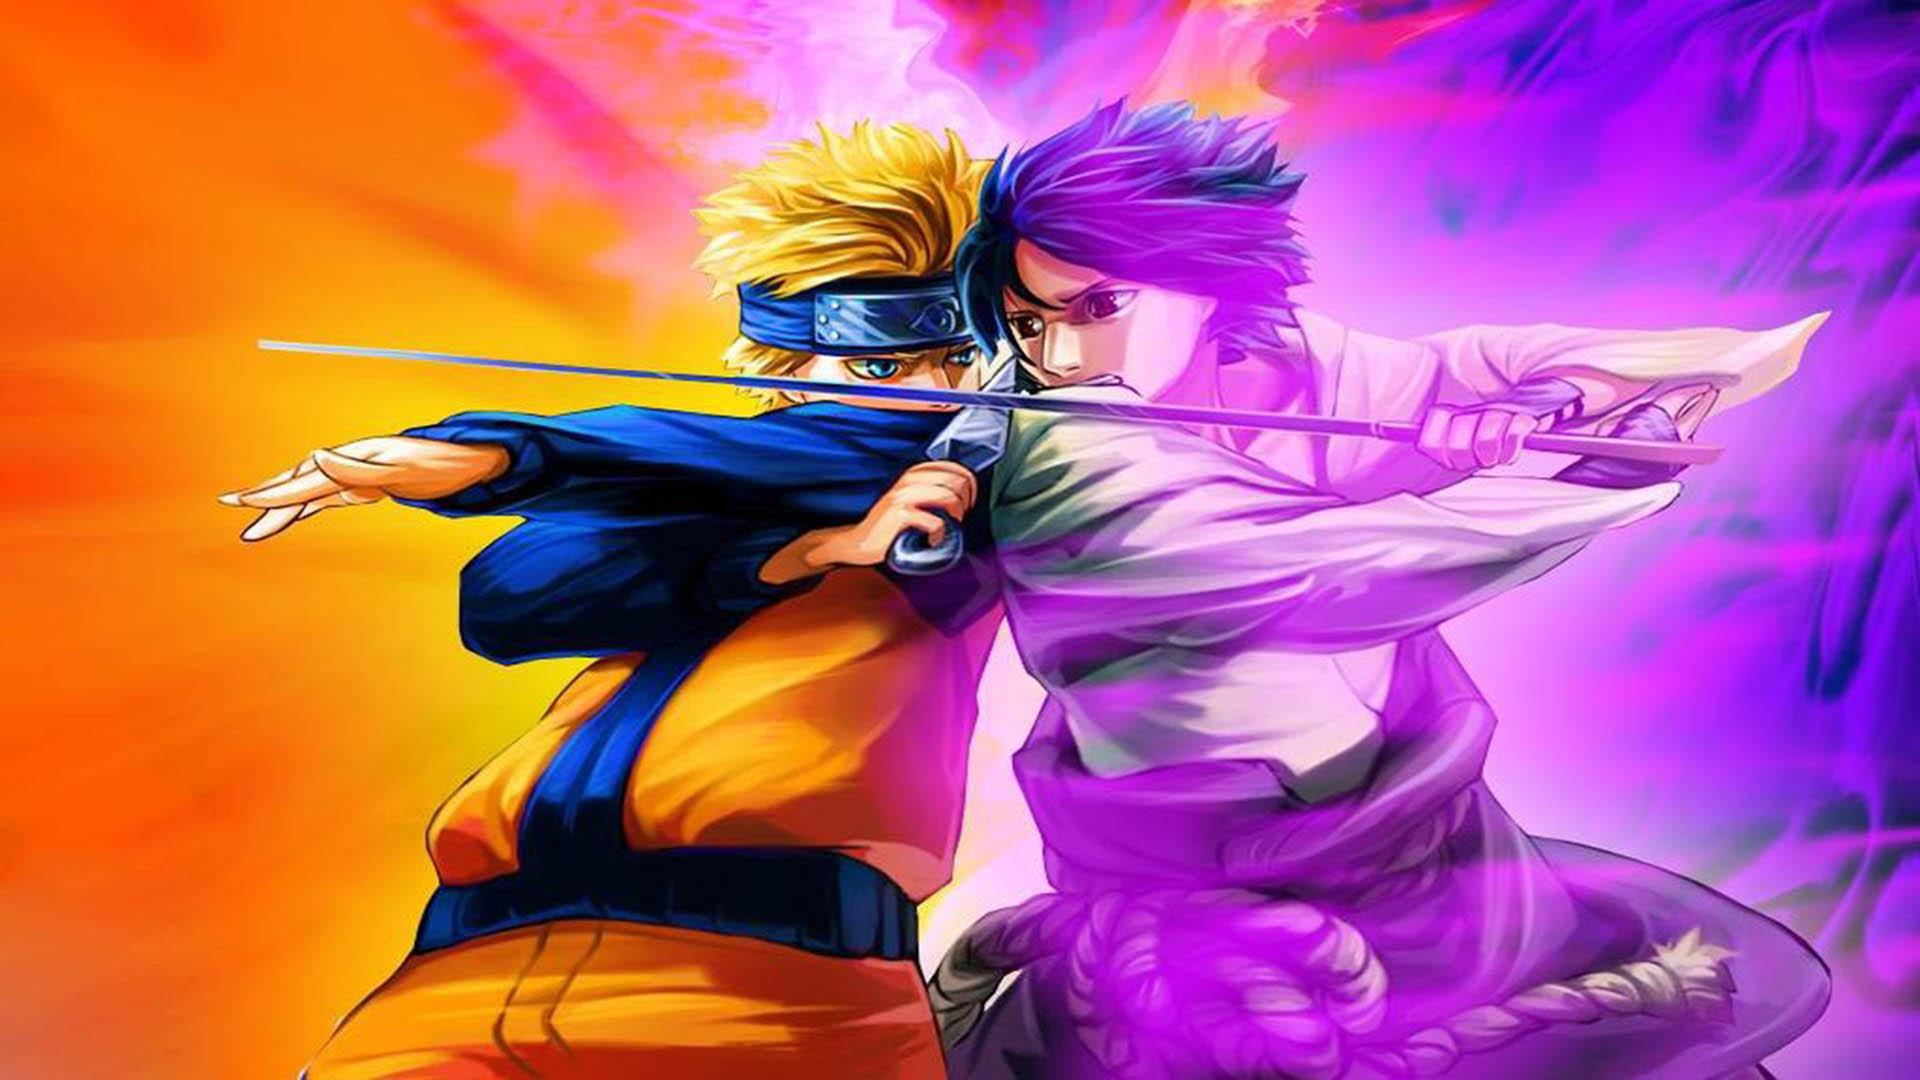 naruto vs sasuke anime wallpaper hd Wallpaper hd Hintergrundbilder 1920x1080